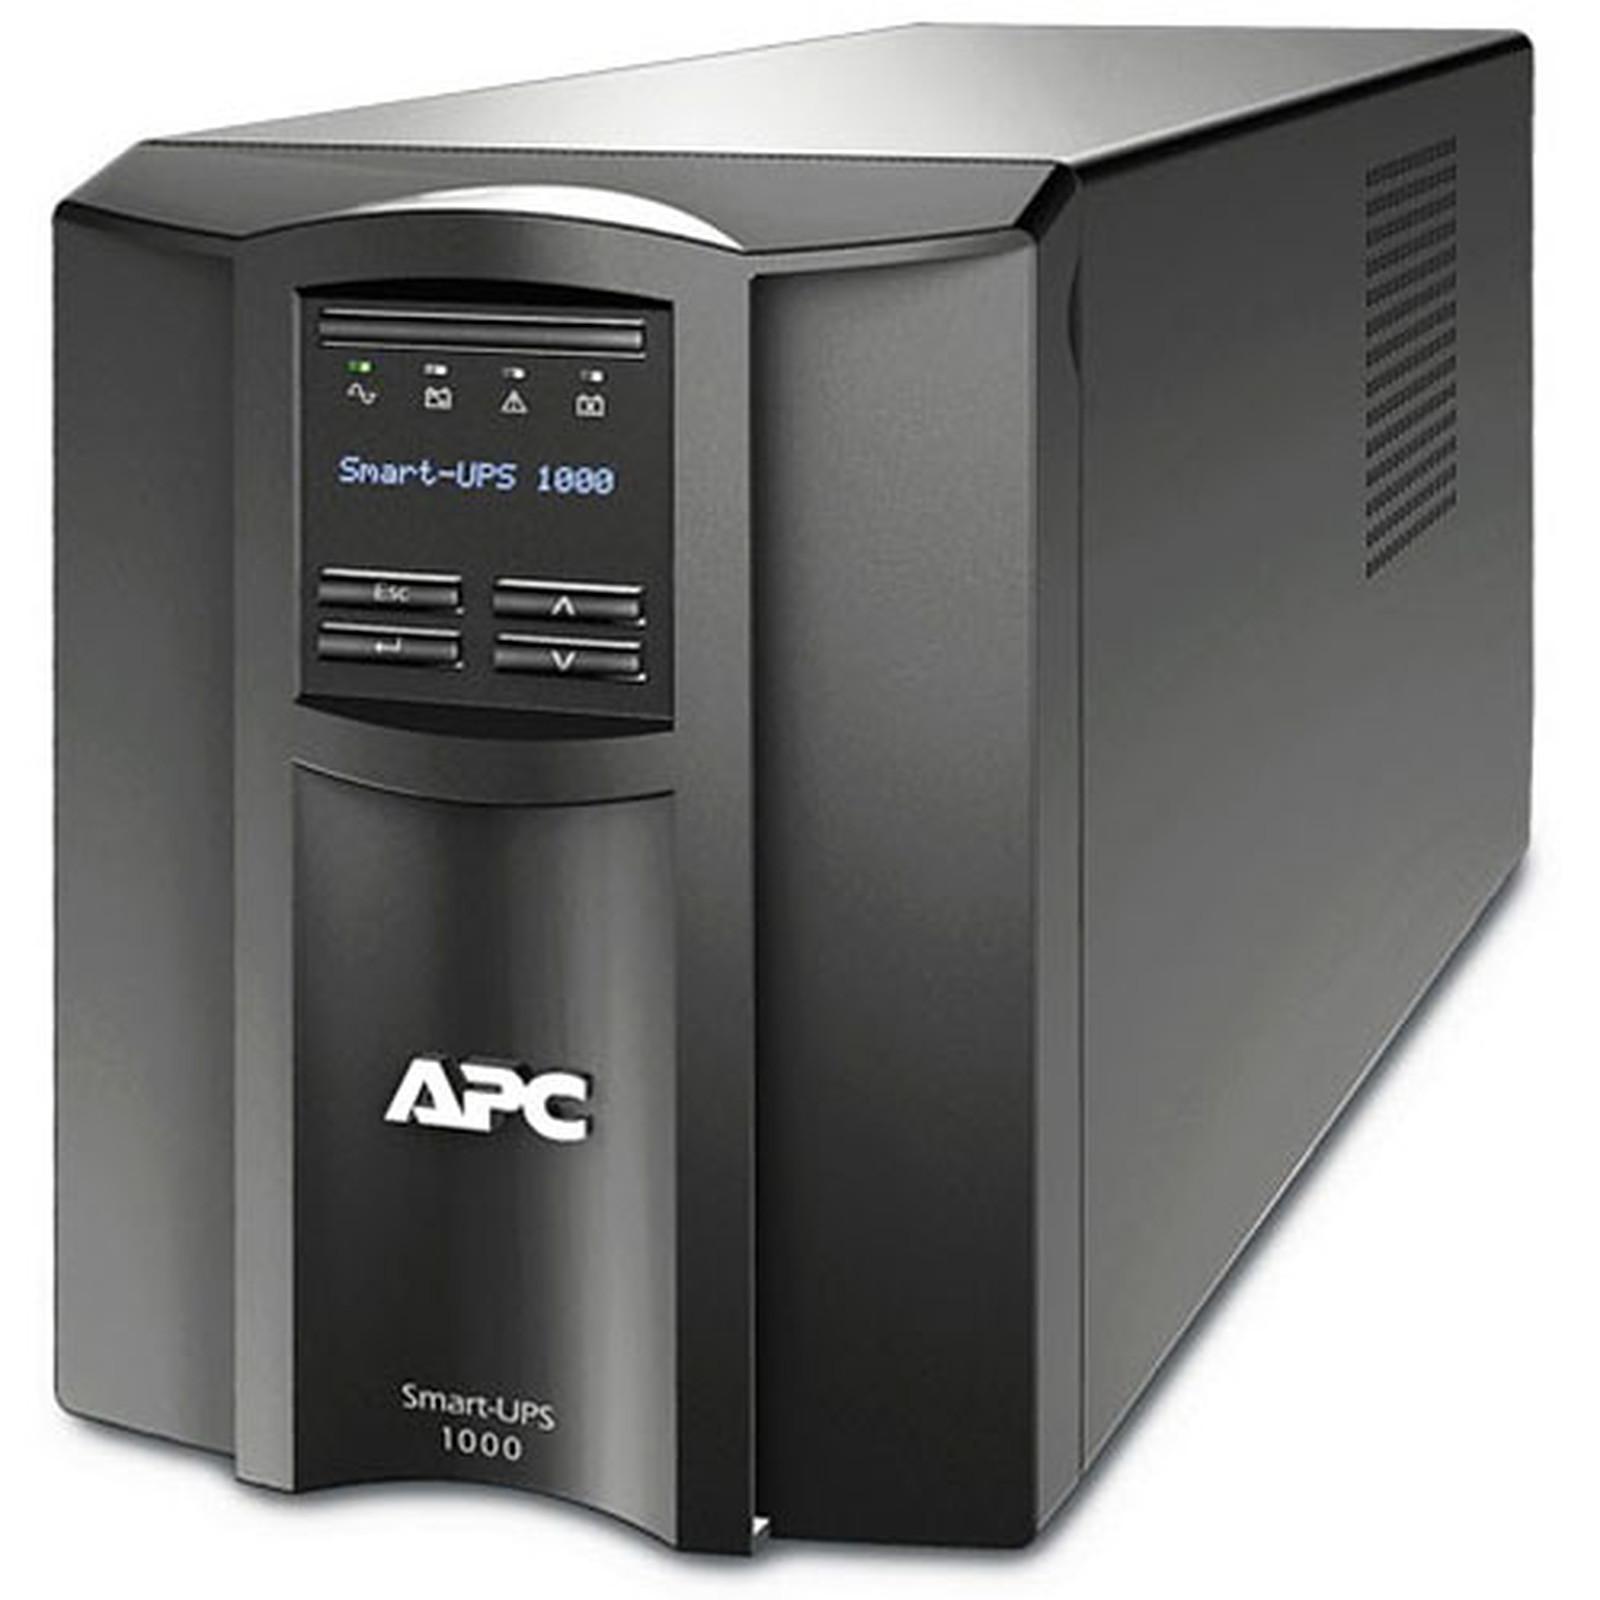 APC Smart-UPS SMT 1000VA Tour